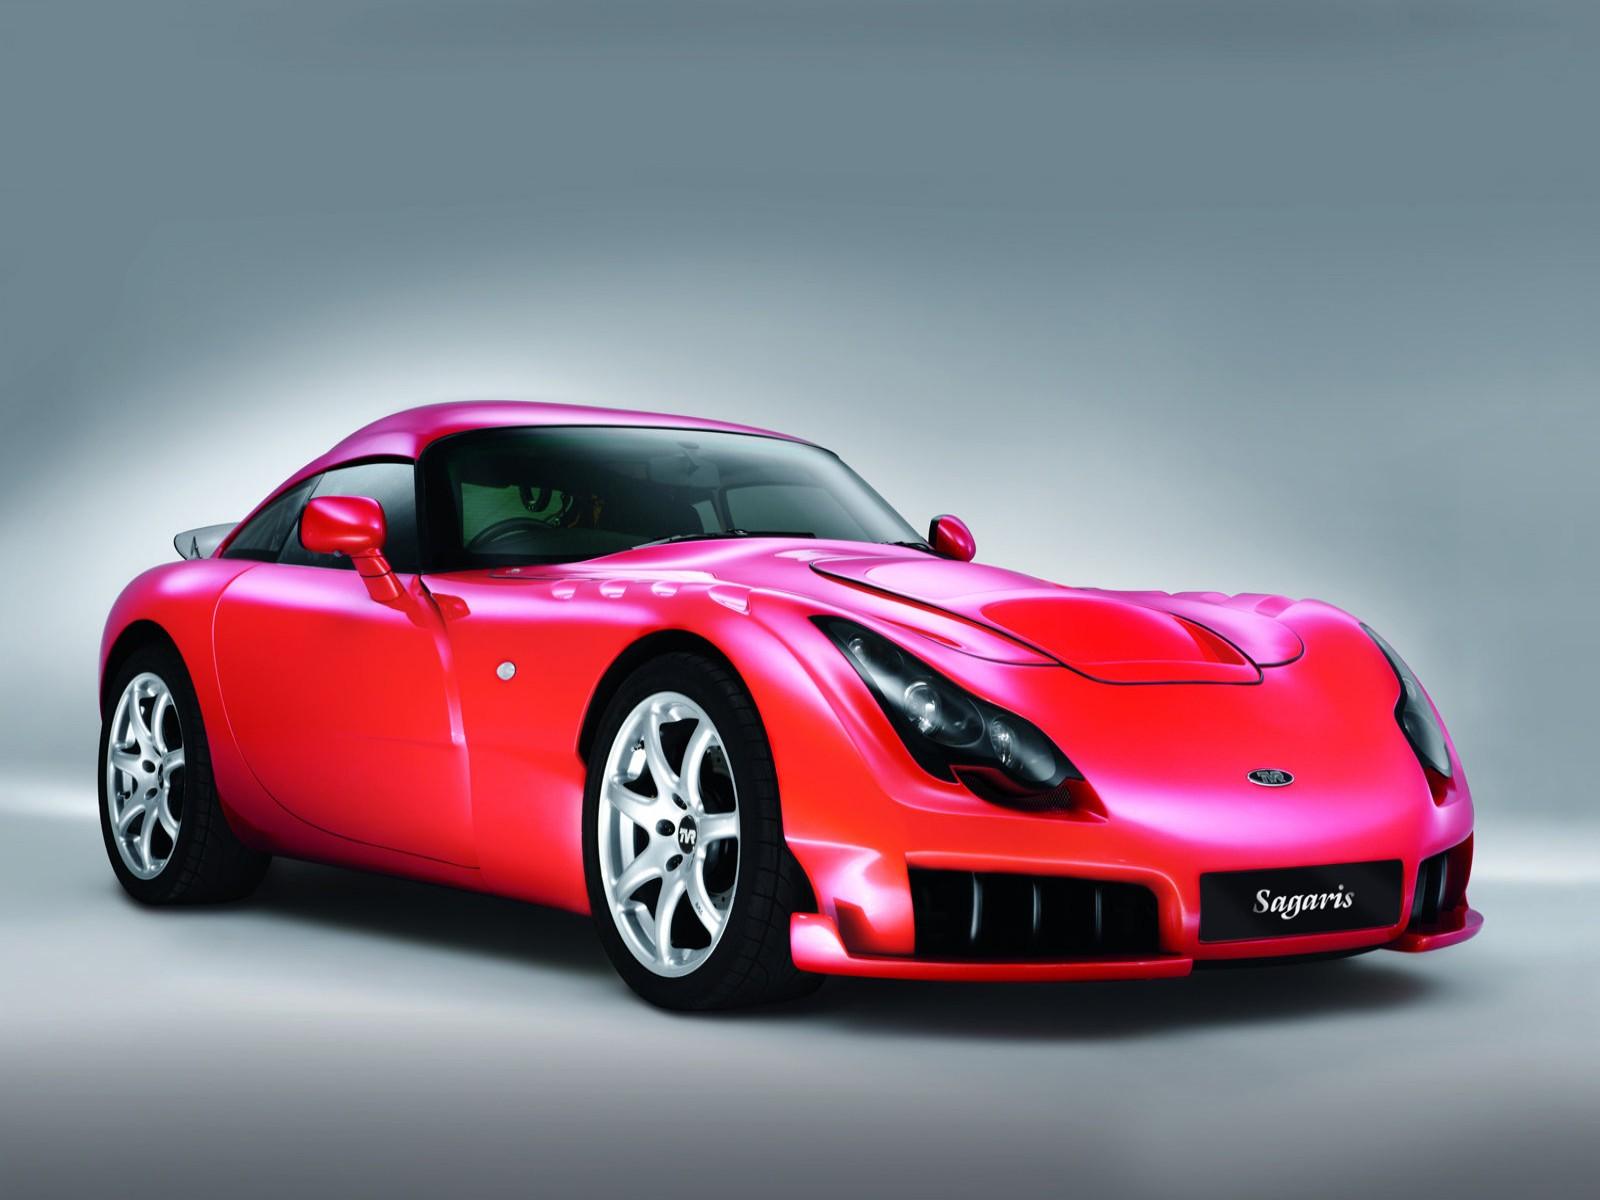 Car Pictures: TVR Sagaris 2006 - 178.8KB